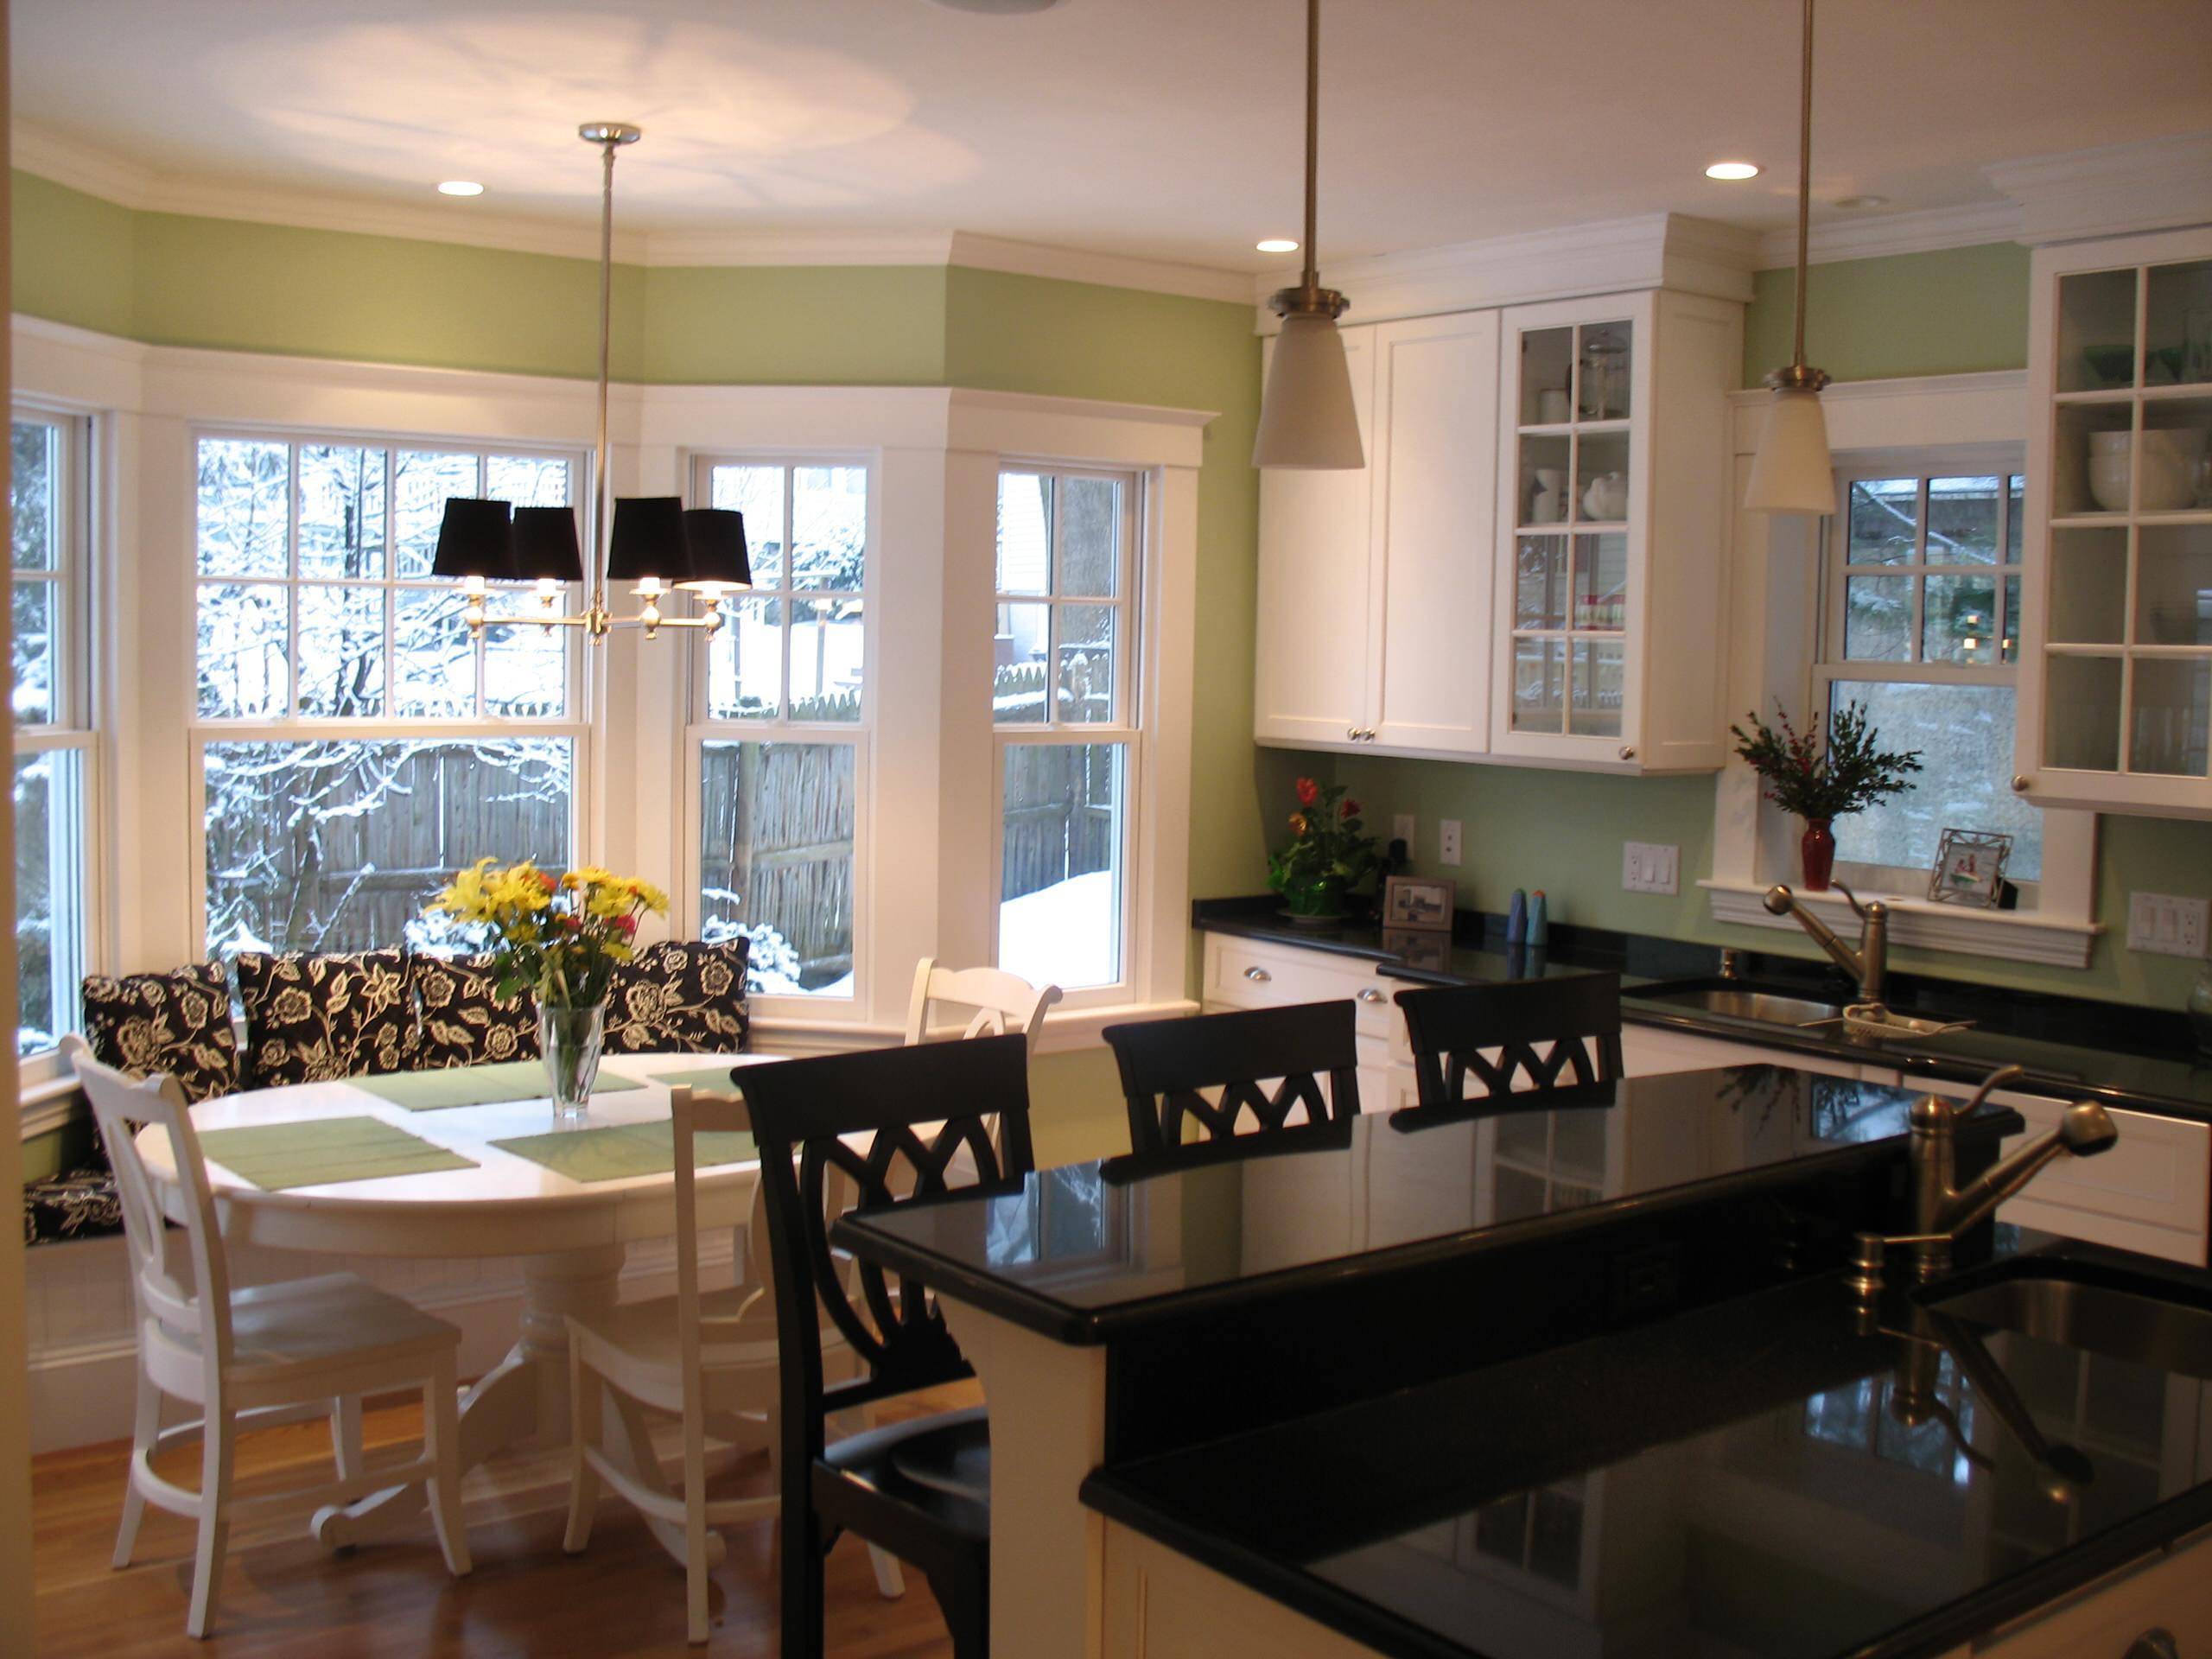 5 Winslow, Winchester, MA - Kitchen Add